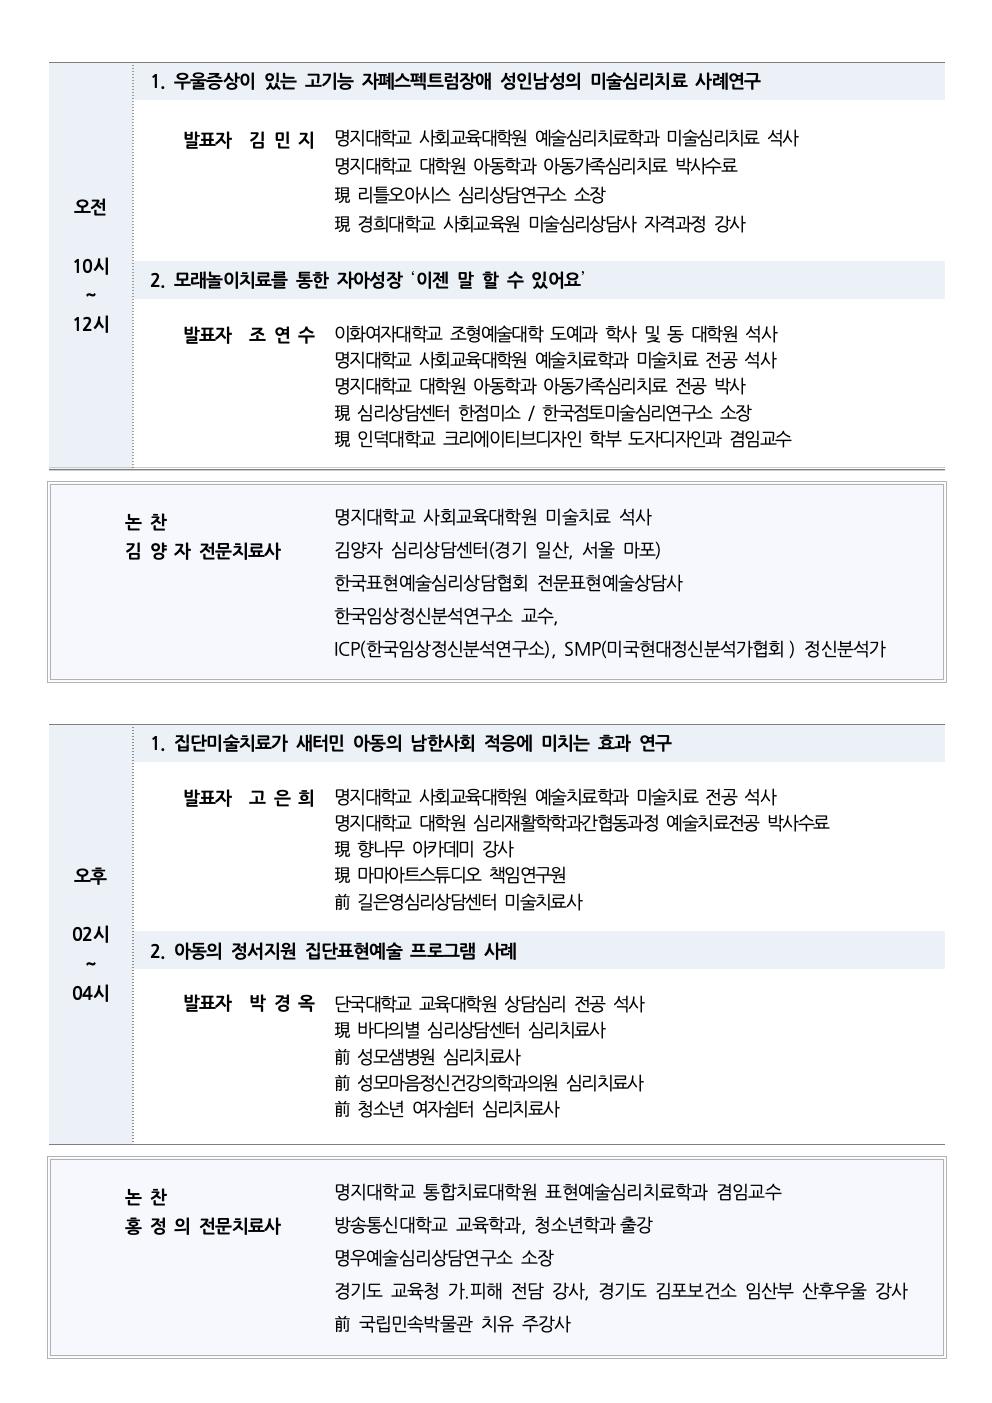 KEAPA_2020-10월사례발표(상세안내)002.jpg